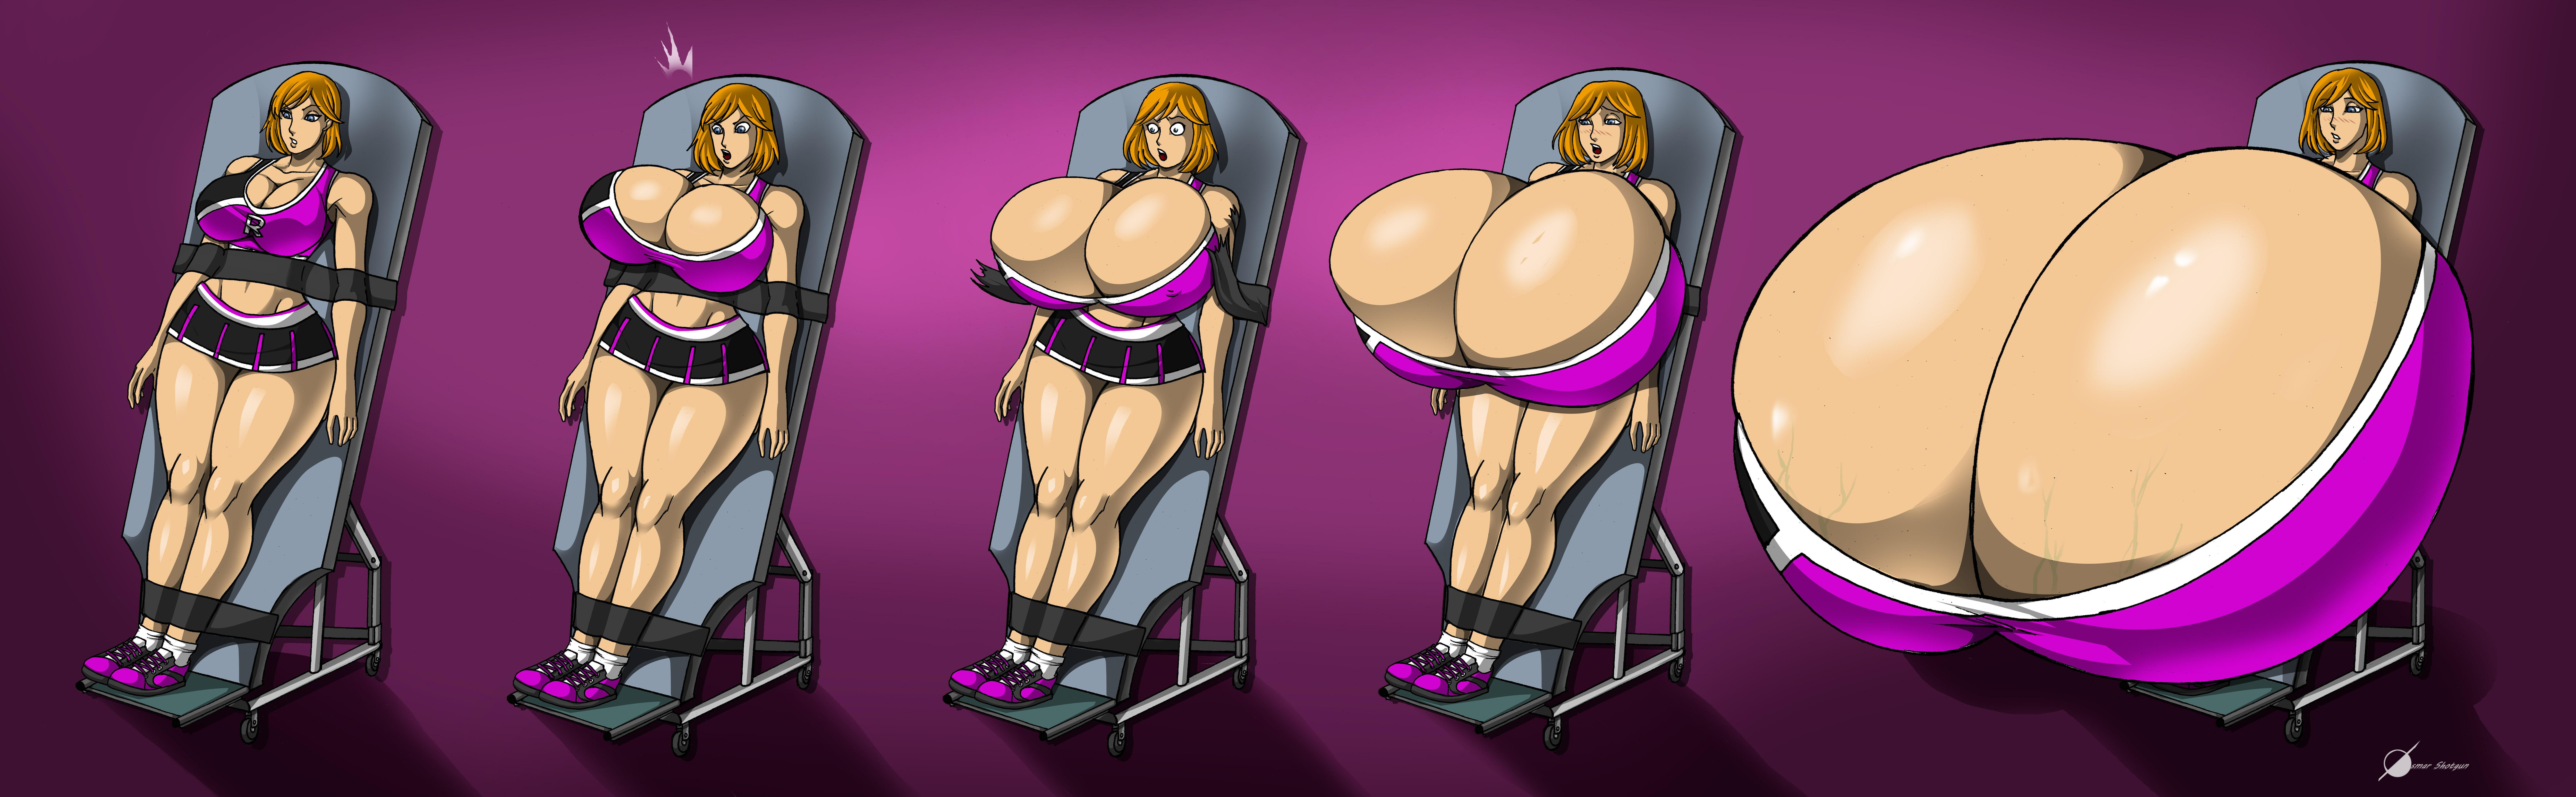 Brickleberry Breast Expansion